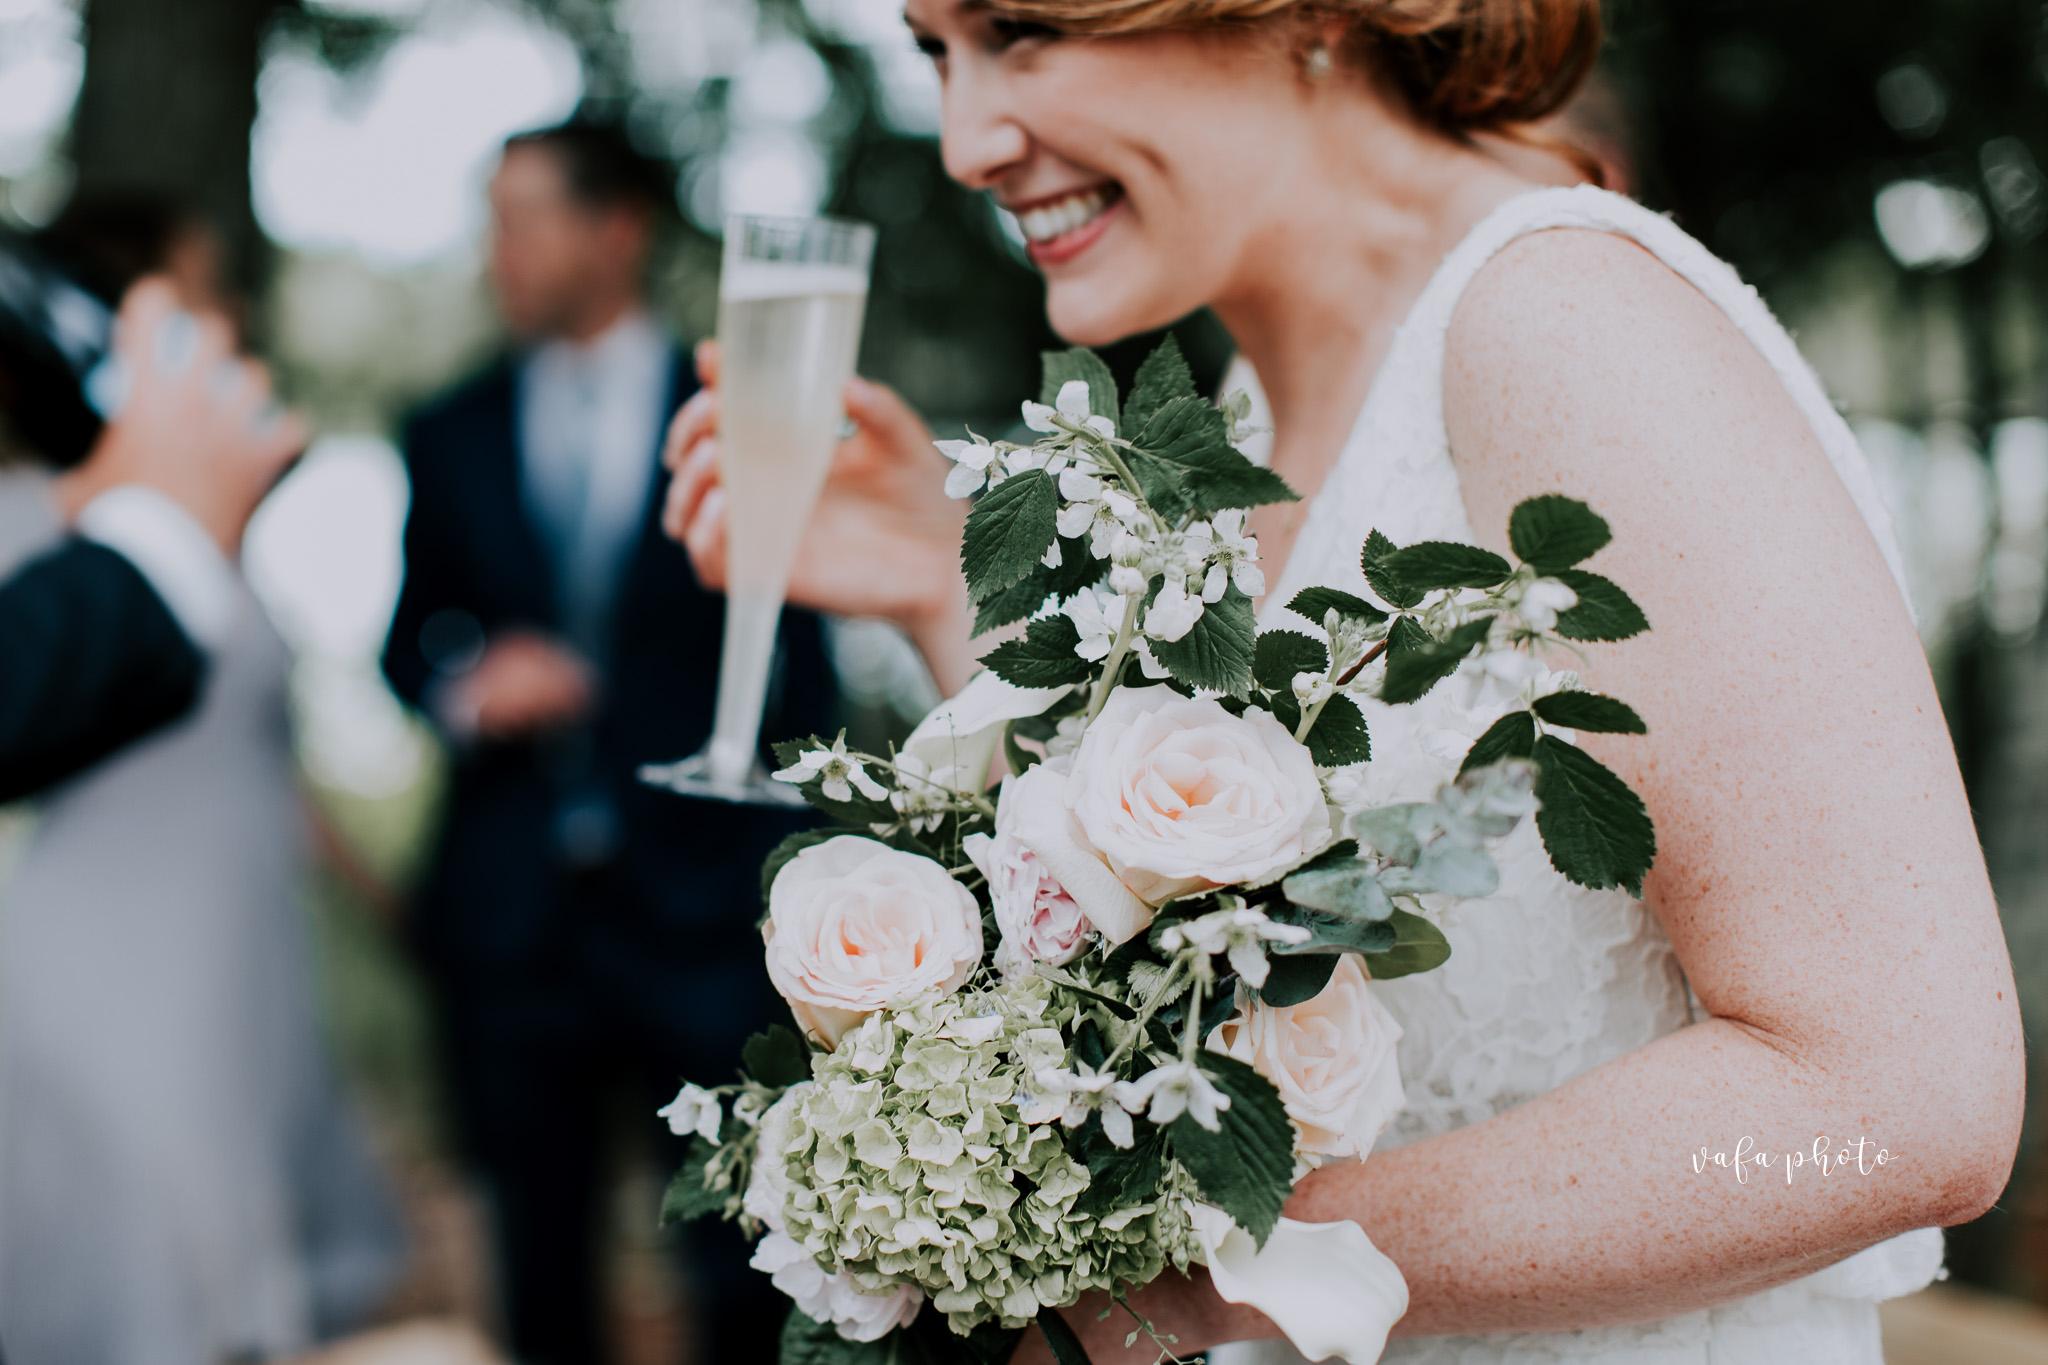 Michigan-Lake-House-Wedding-Madeline-Patrick-Vafa-Photo-508.jpg